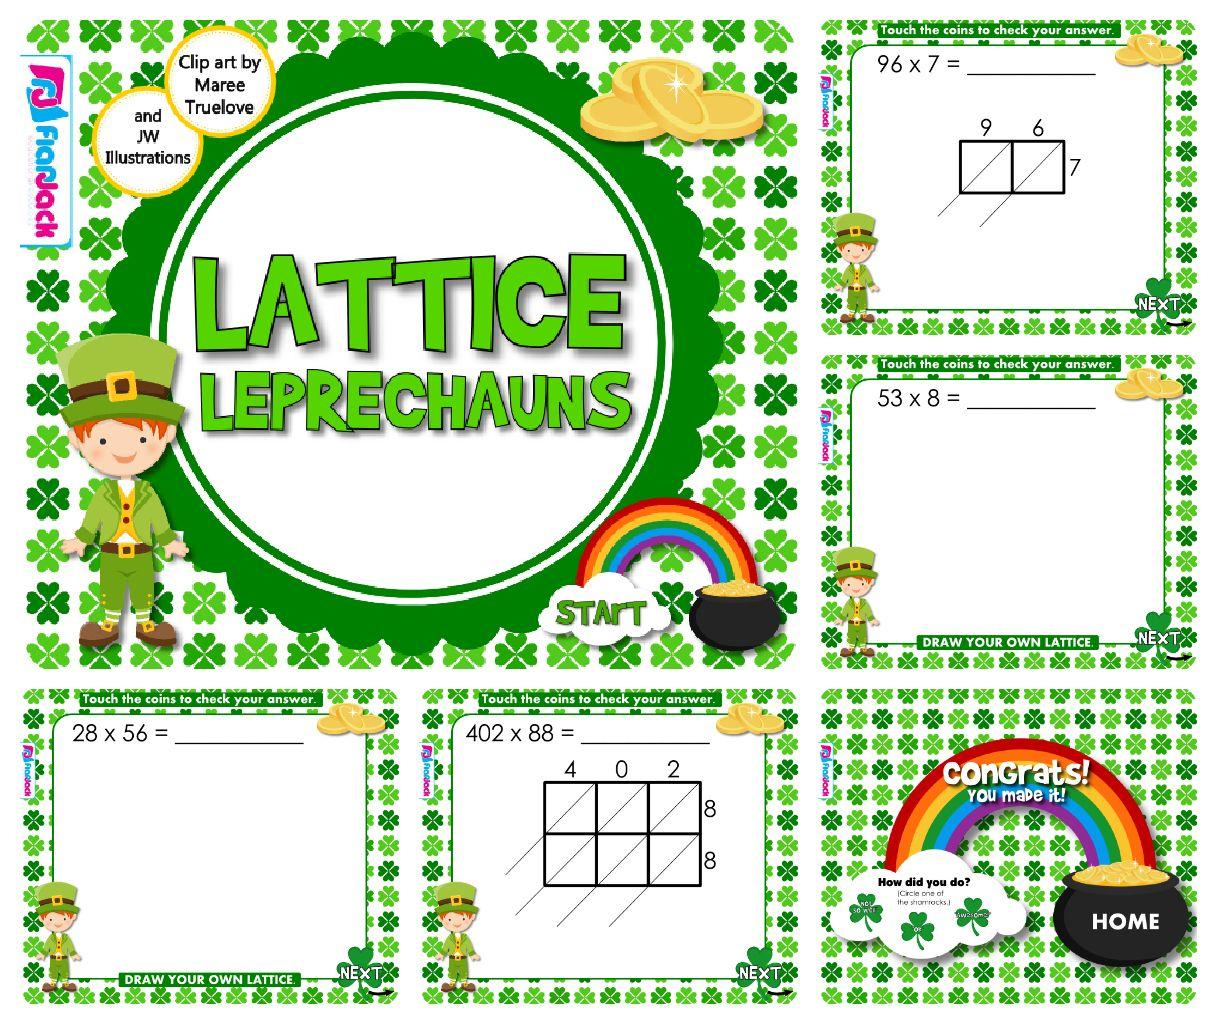 Lattice Leprechauns Multiplication Smart Board Promethean Game